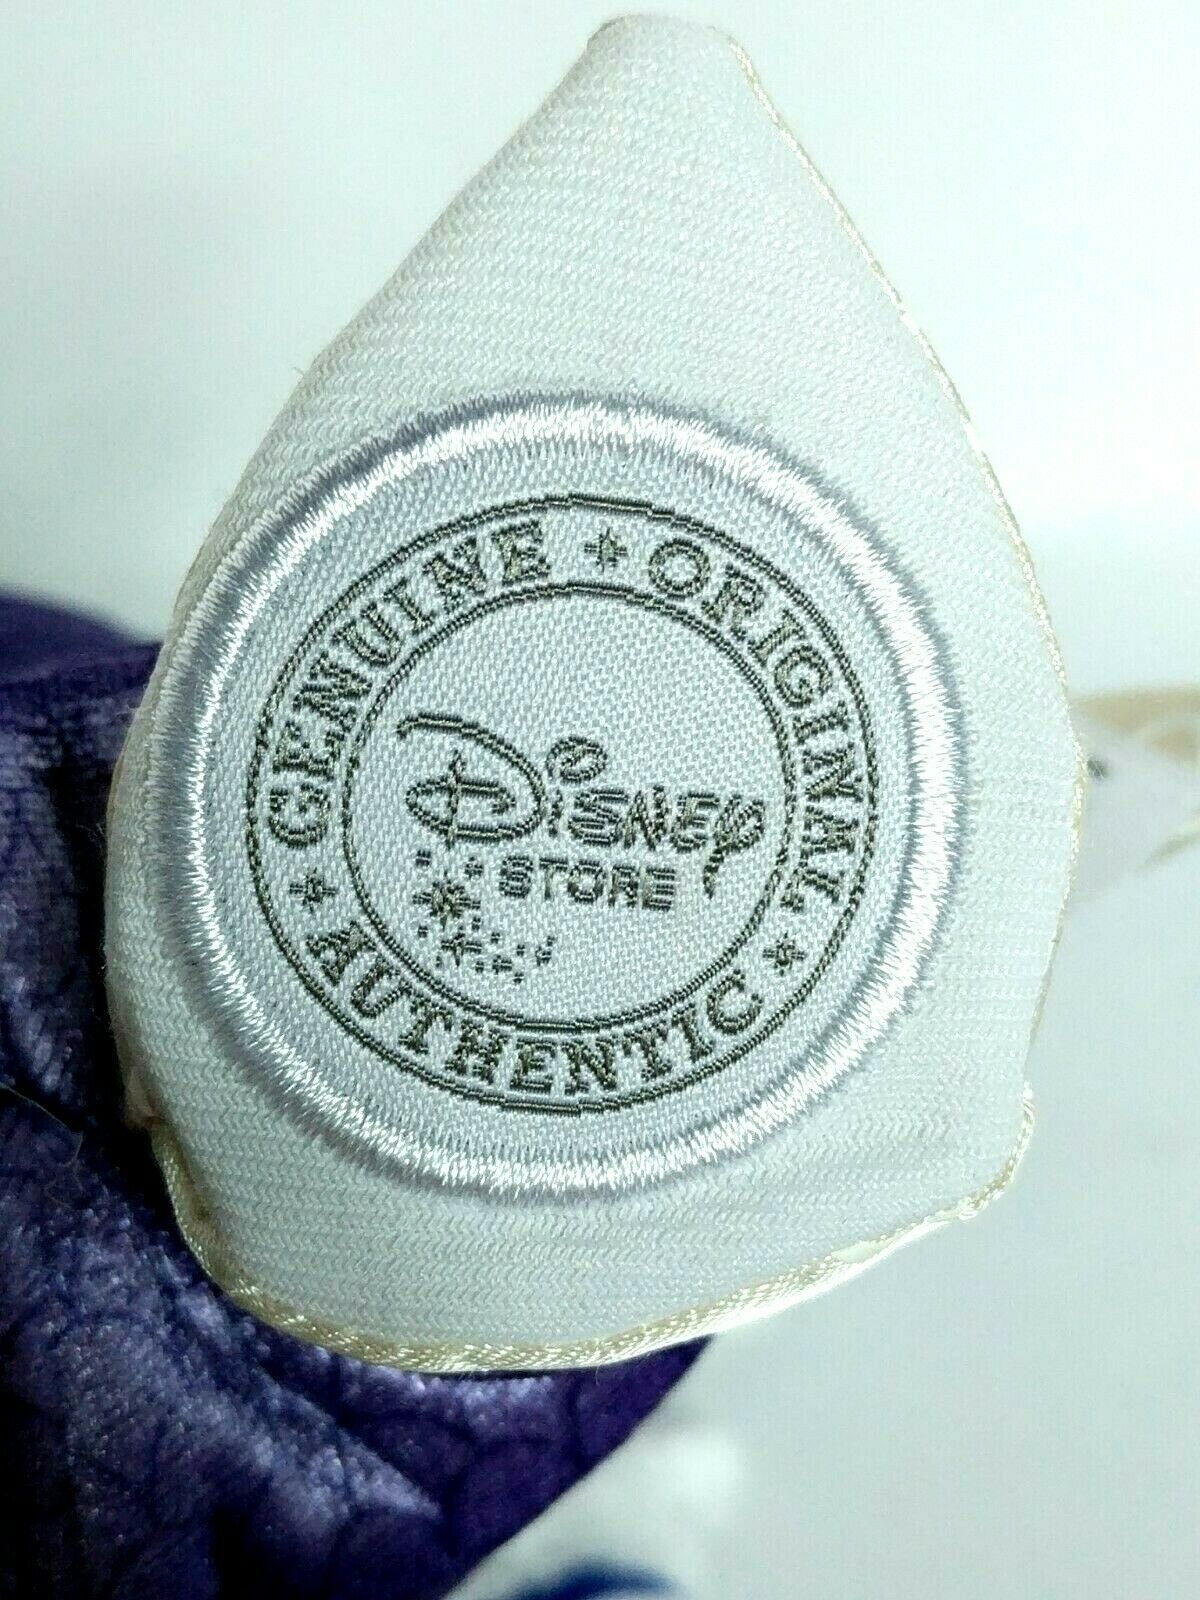 "Disney Store Pixar Monsters Inc Boo In Costume Plush Stuffed Animal 15"" image 3"